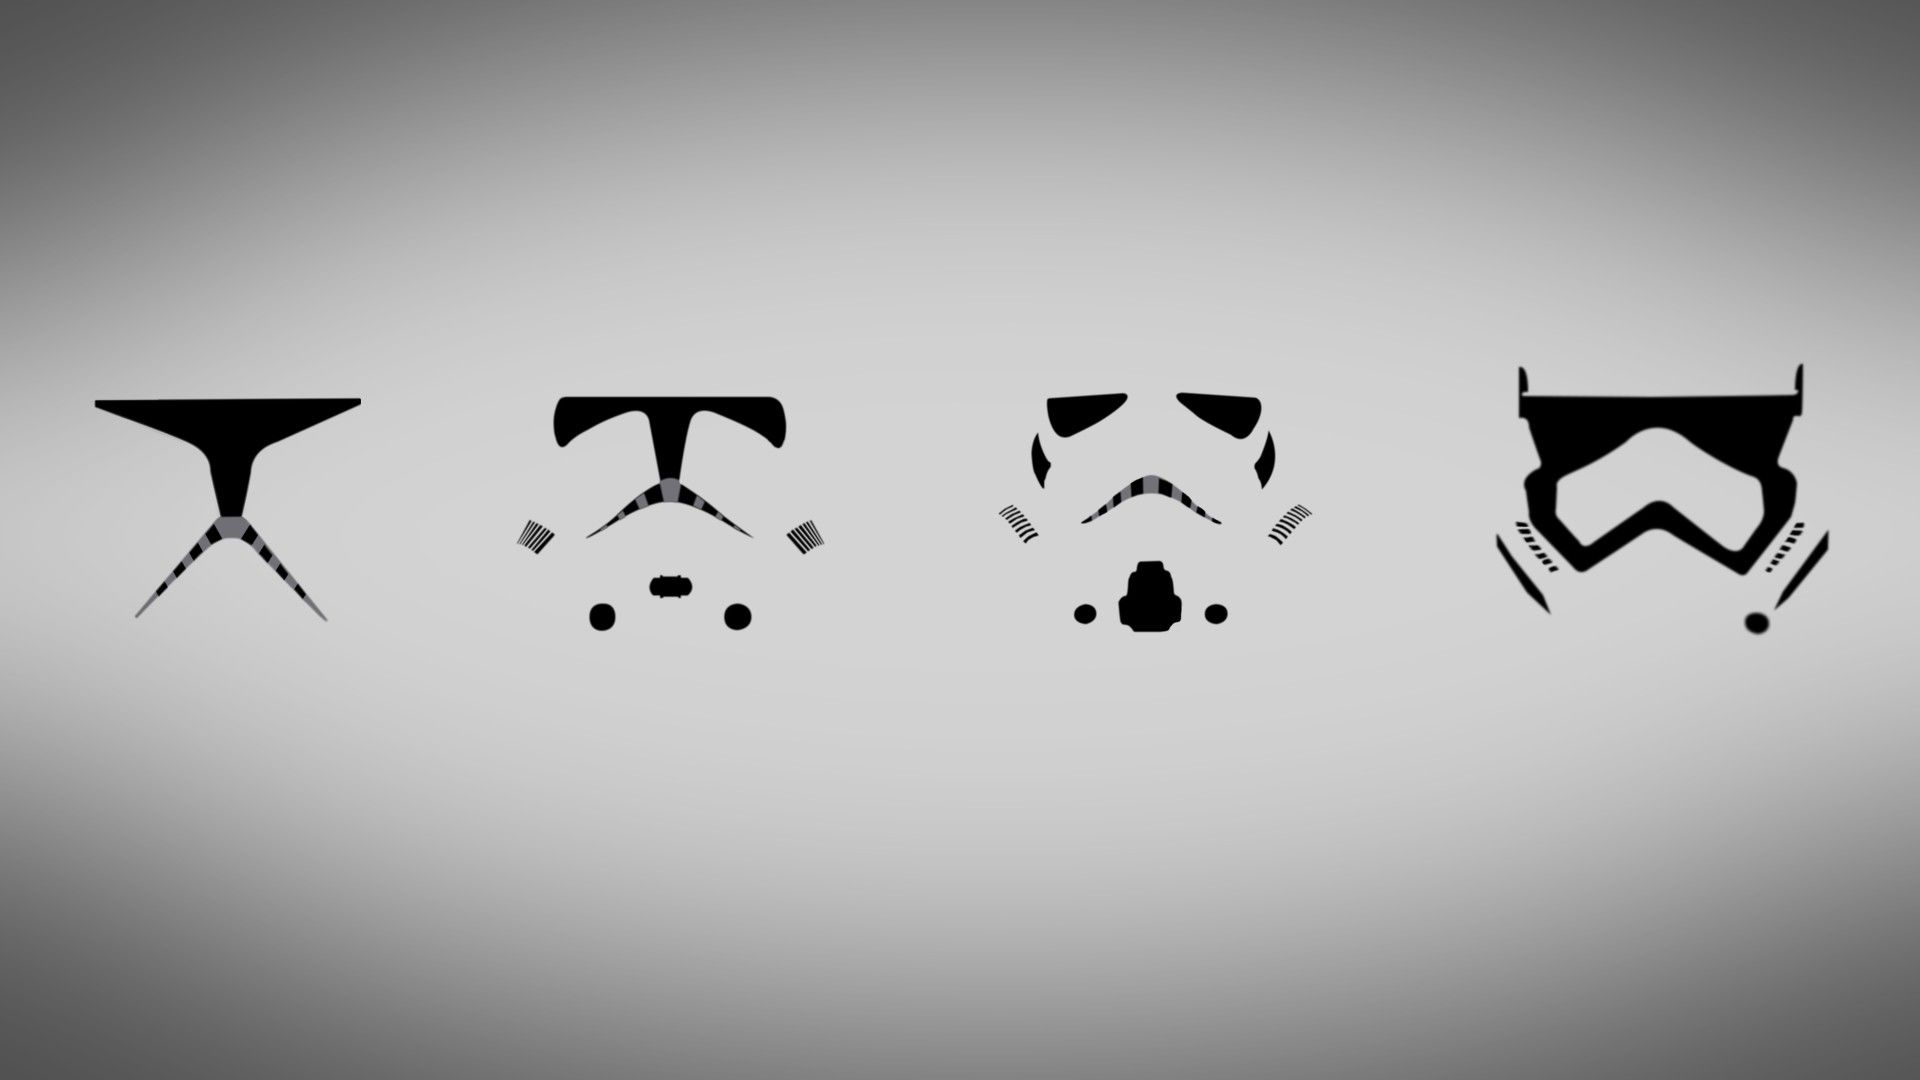 Star Wars Stormtrooper Simple Clone Trooper Minimalism Wallpaper No 93783 Wallpaper Tumblr